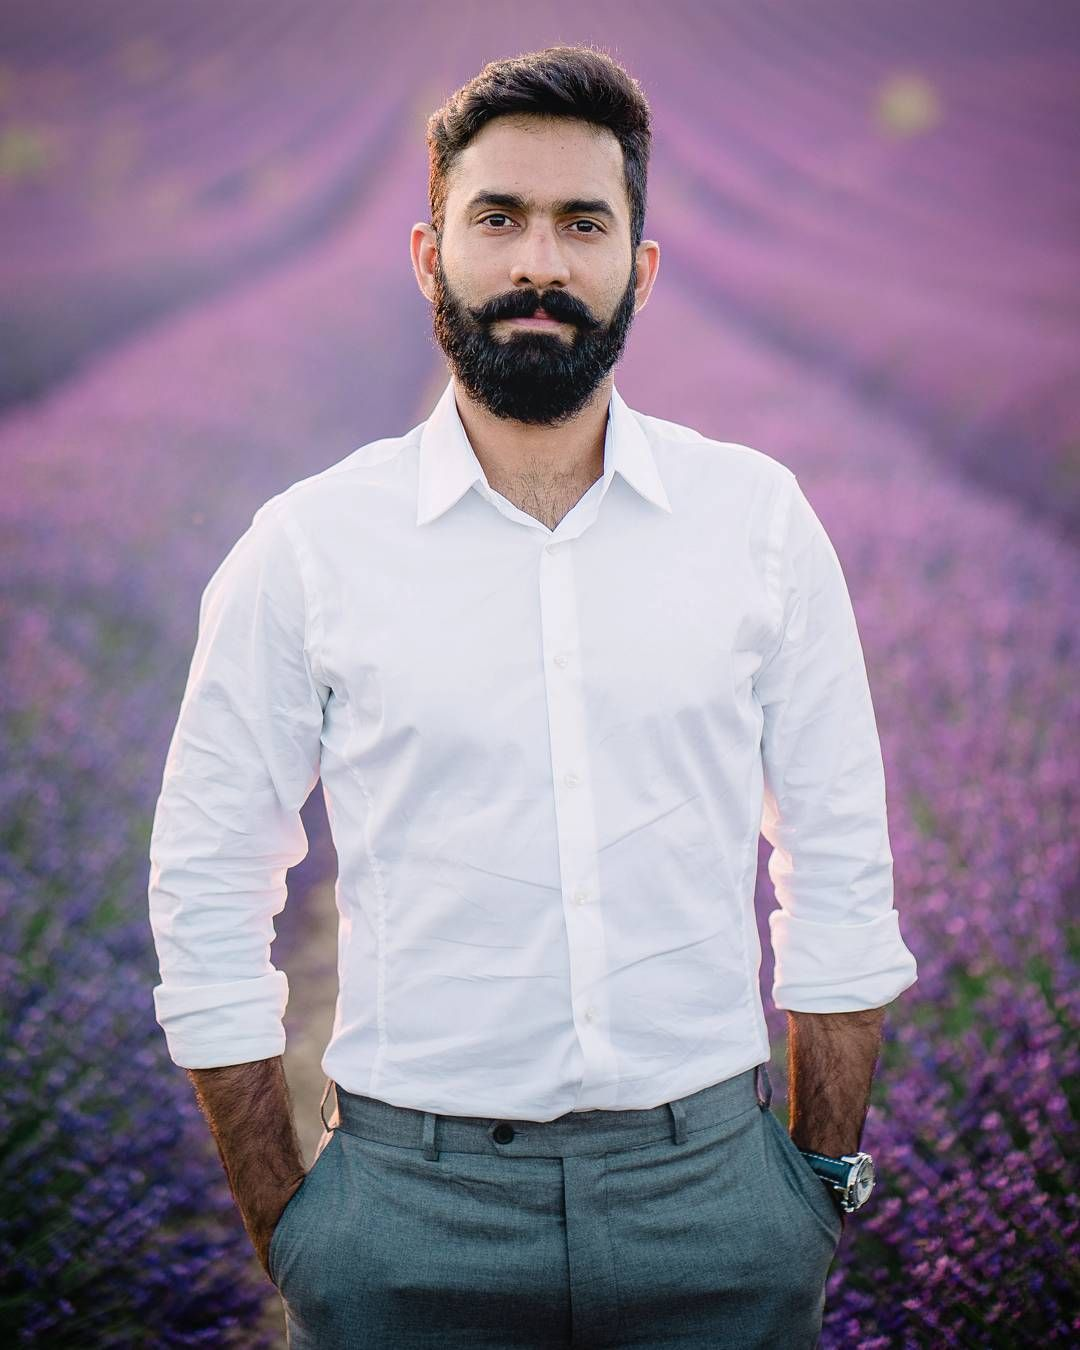 "Joseph Radhik on Instagram: ""Beard goals. Dinesh (Karthik) showing off that deadly #beard. #movember #movember2015 #beardgoals #makeportraits #postthepeople #dude…"""